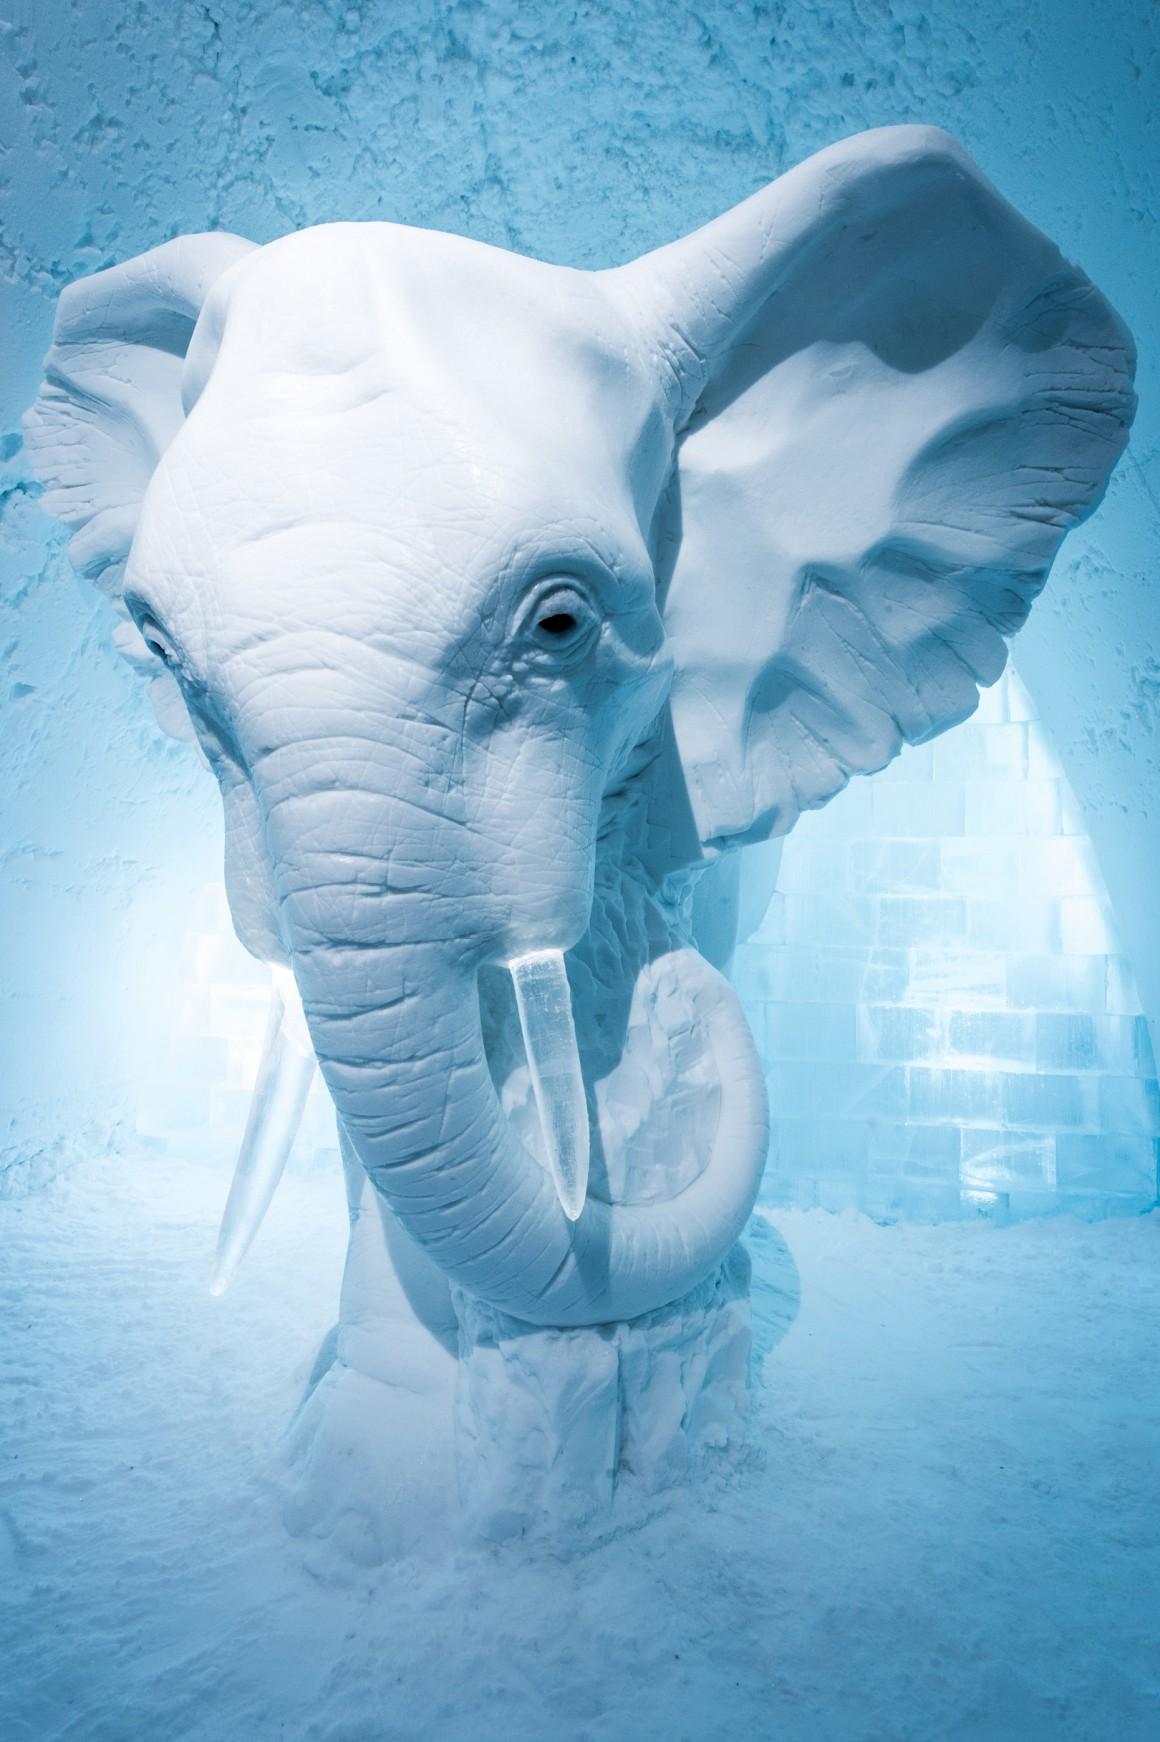 Art Suite: Elephant in the Room. Design: AnnaSofia Mååg (Suécia)